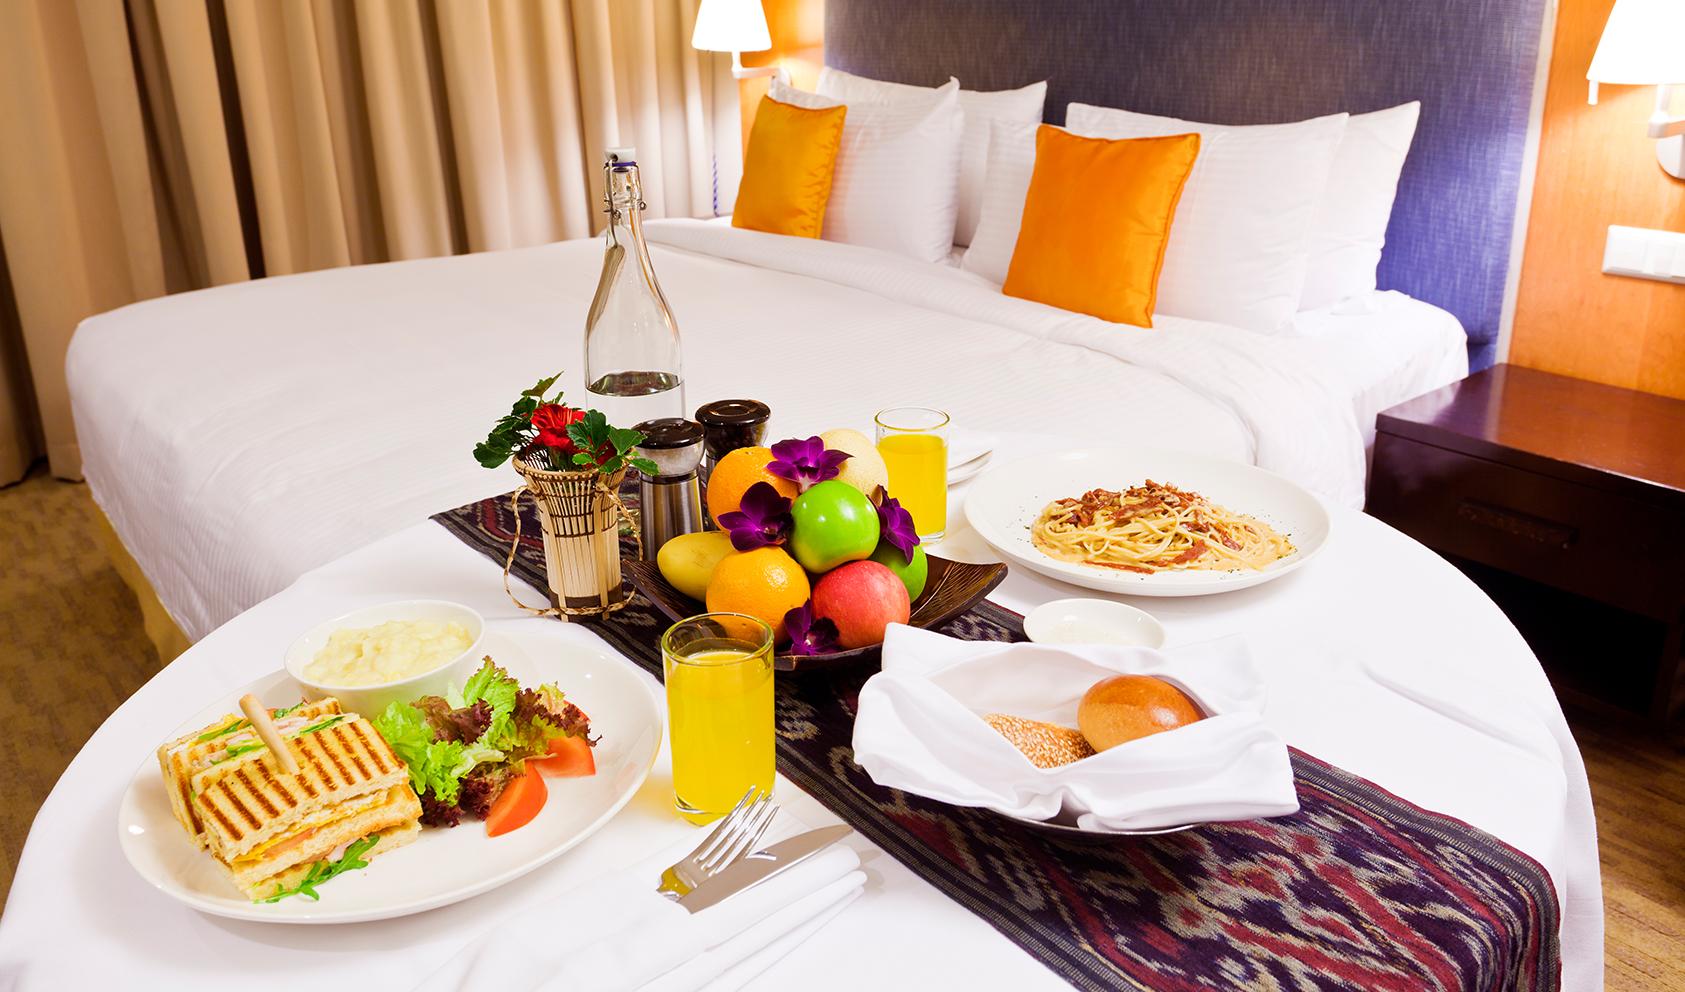 Room service table to keep food warm